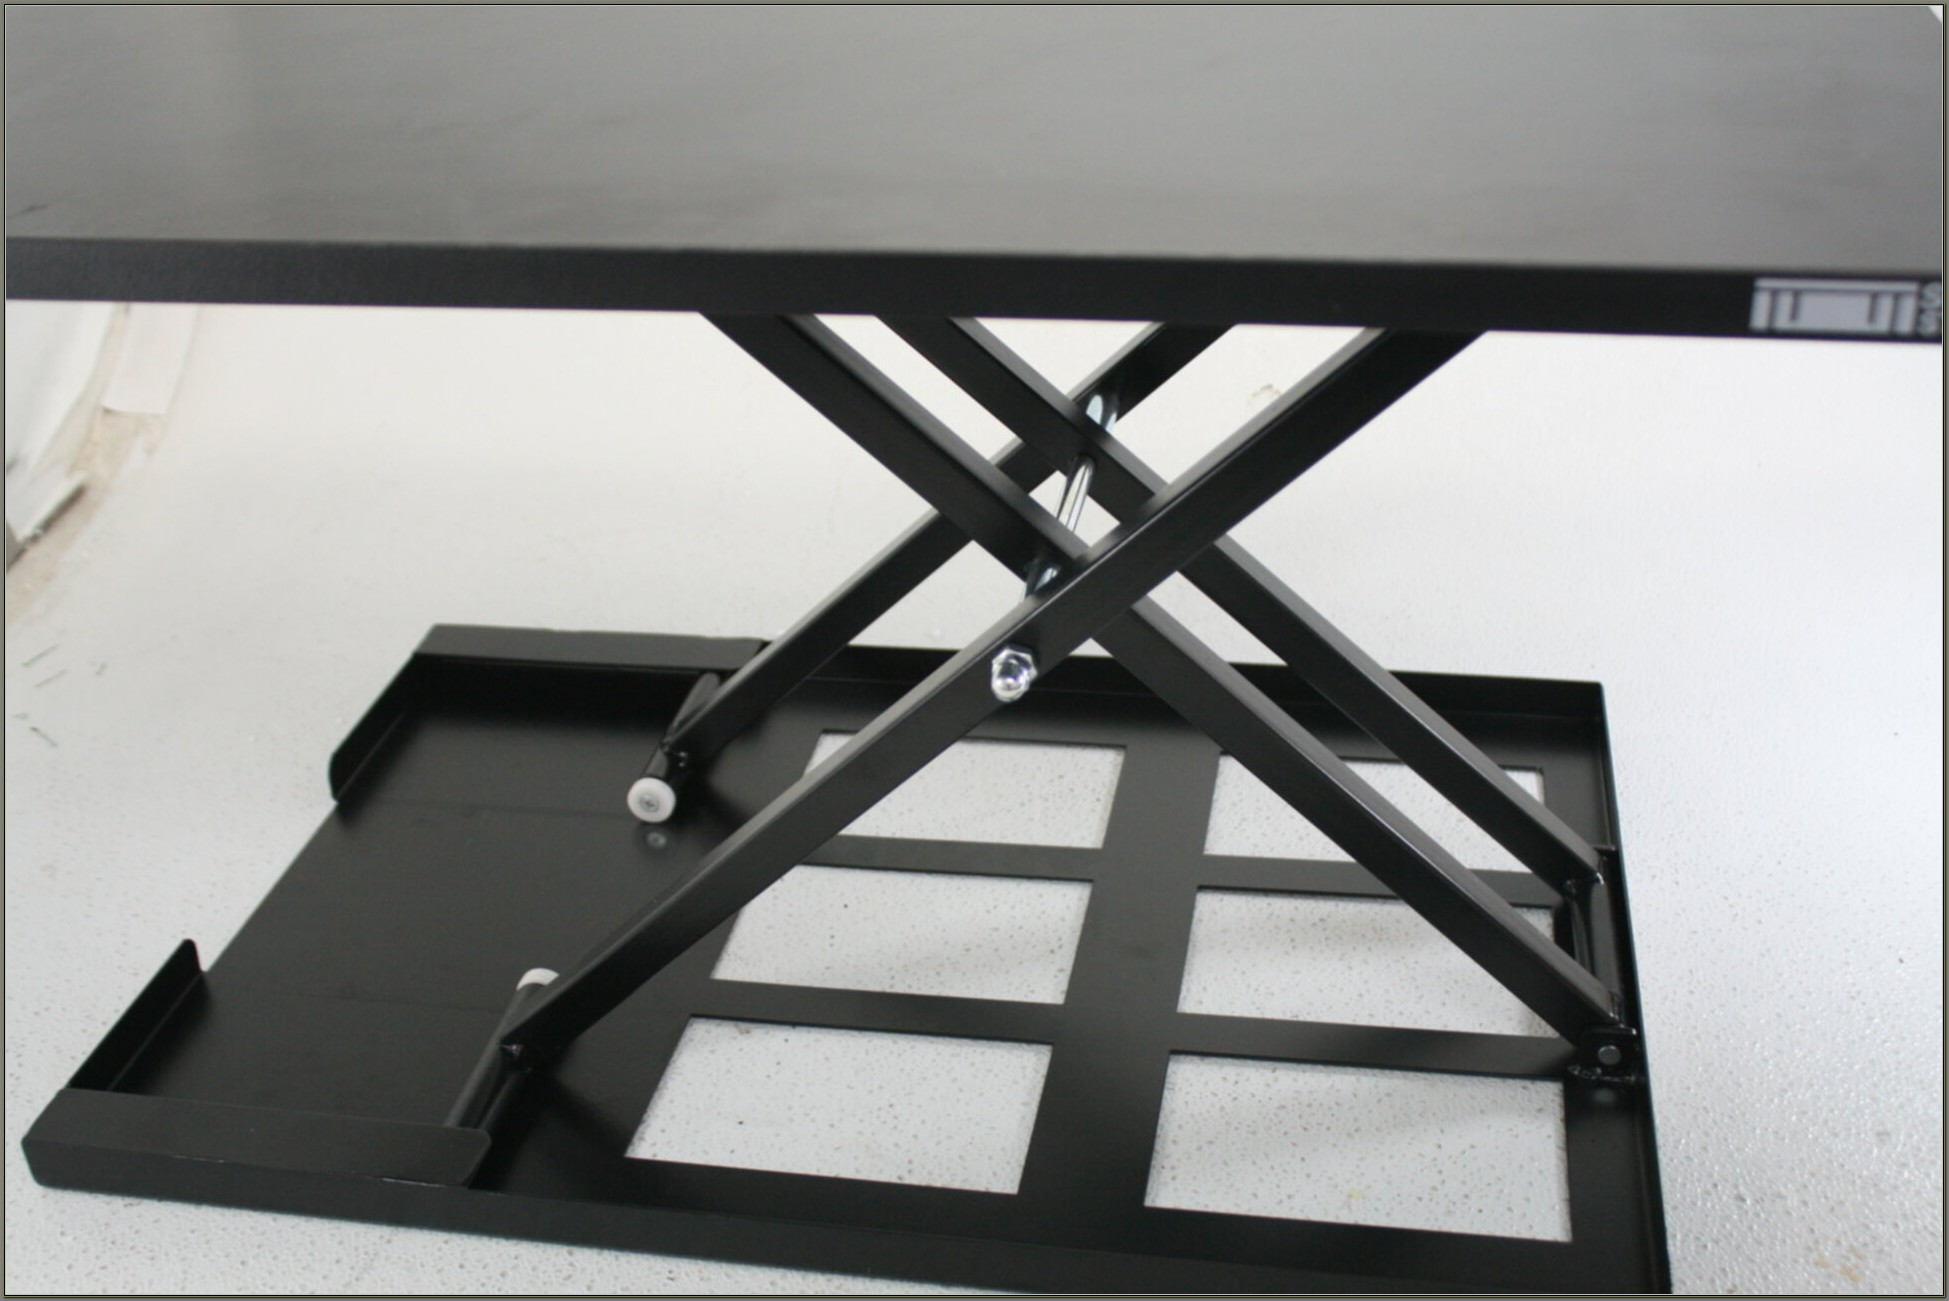 Convert Sitting Desk To Standing Desk